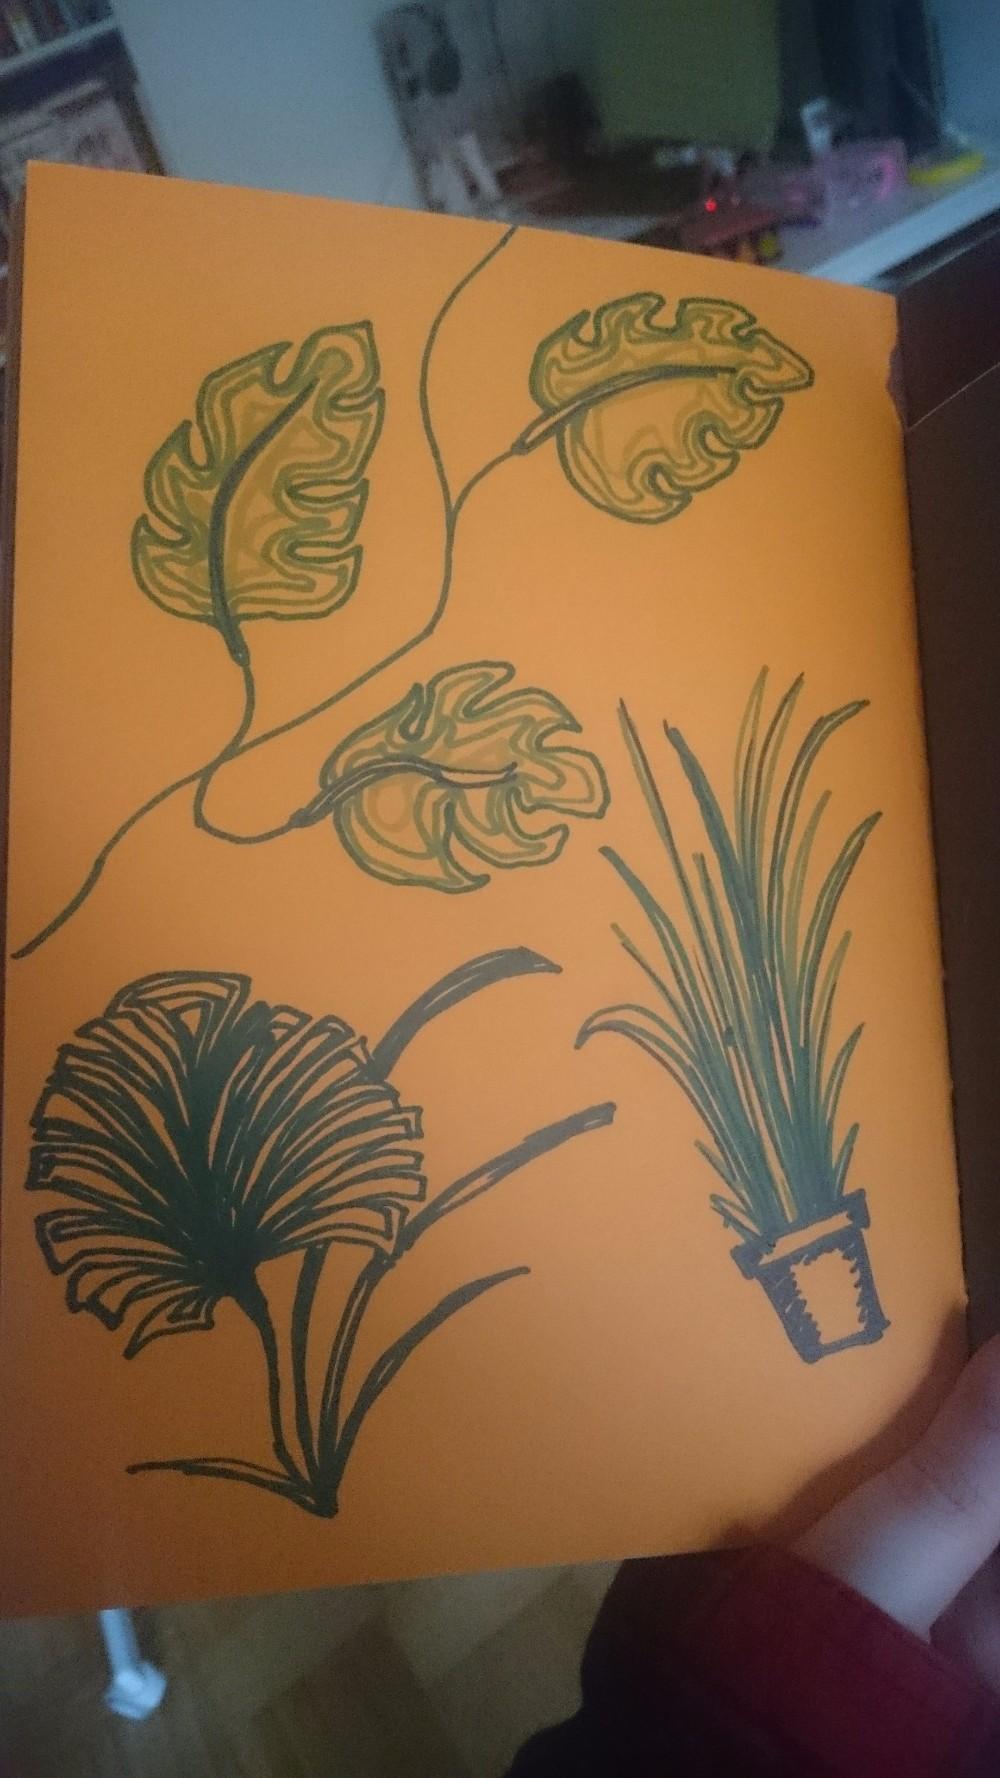 Sketchbook Magic - image 13 - student project